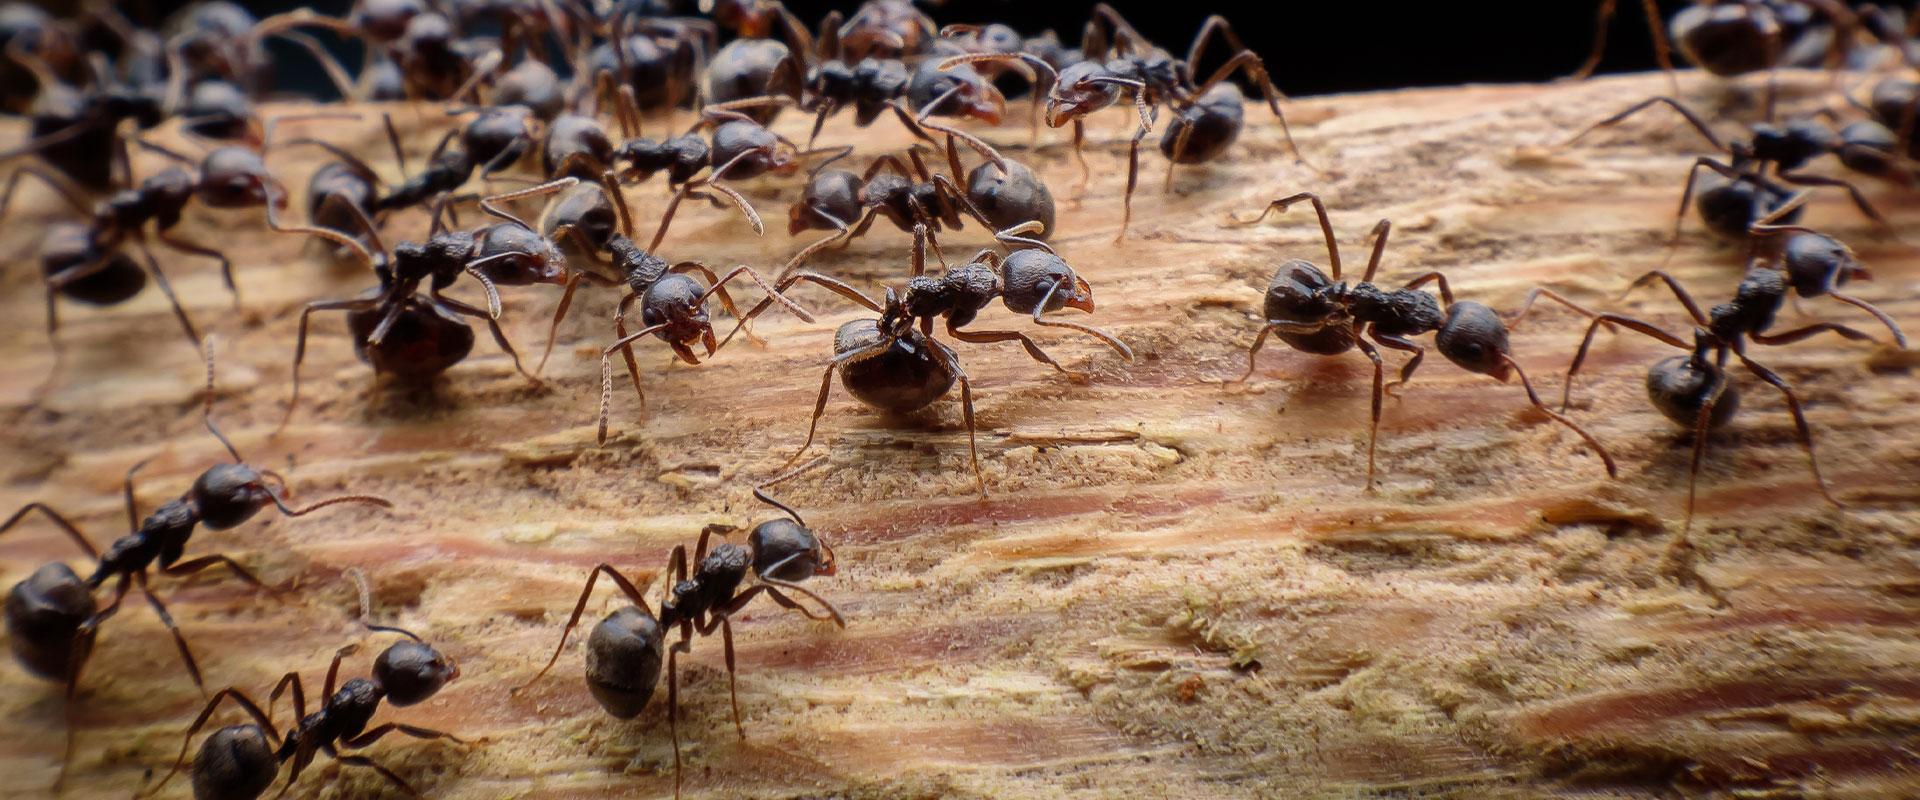 carpenter ants on damaged wood